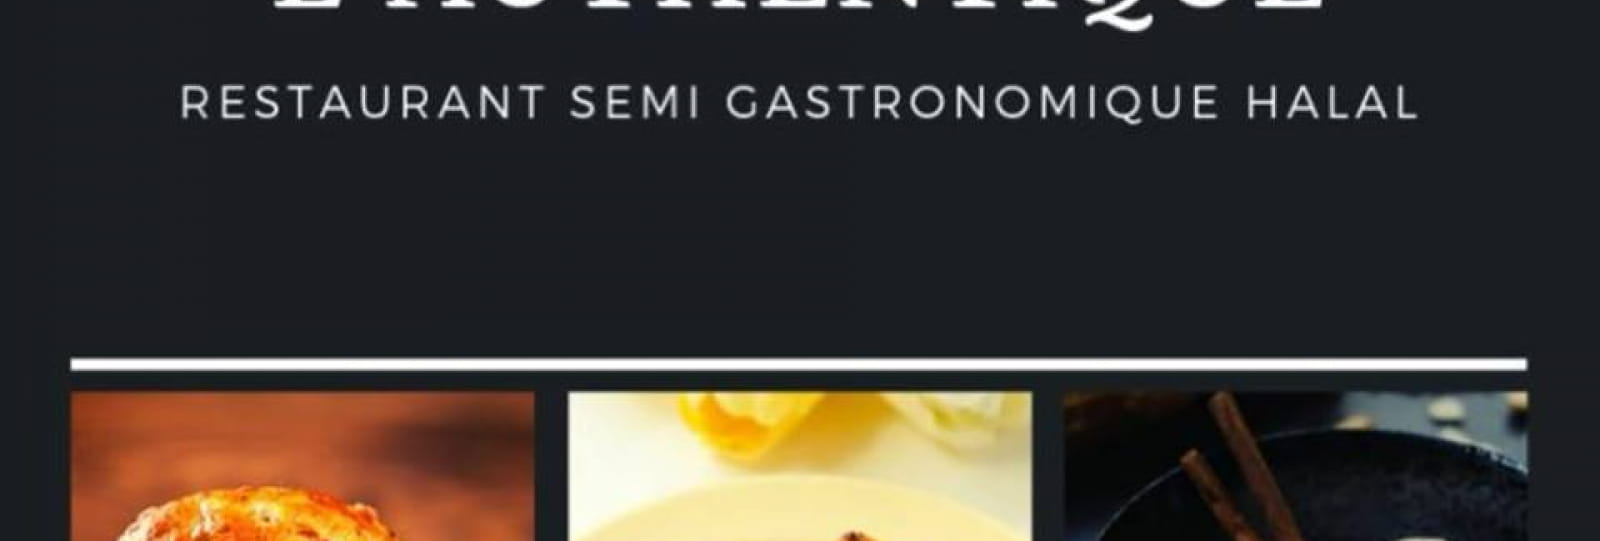 Restaurant l'Authentique